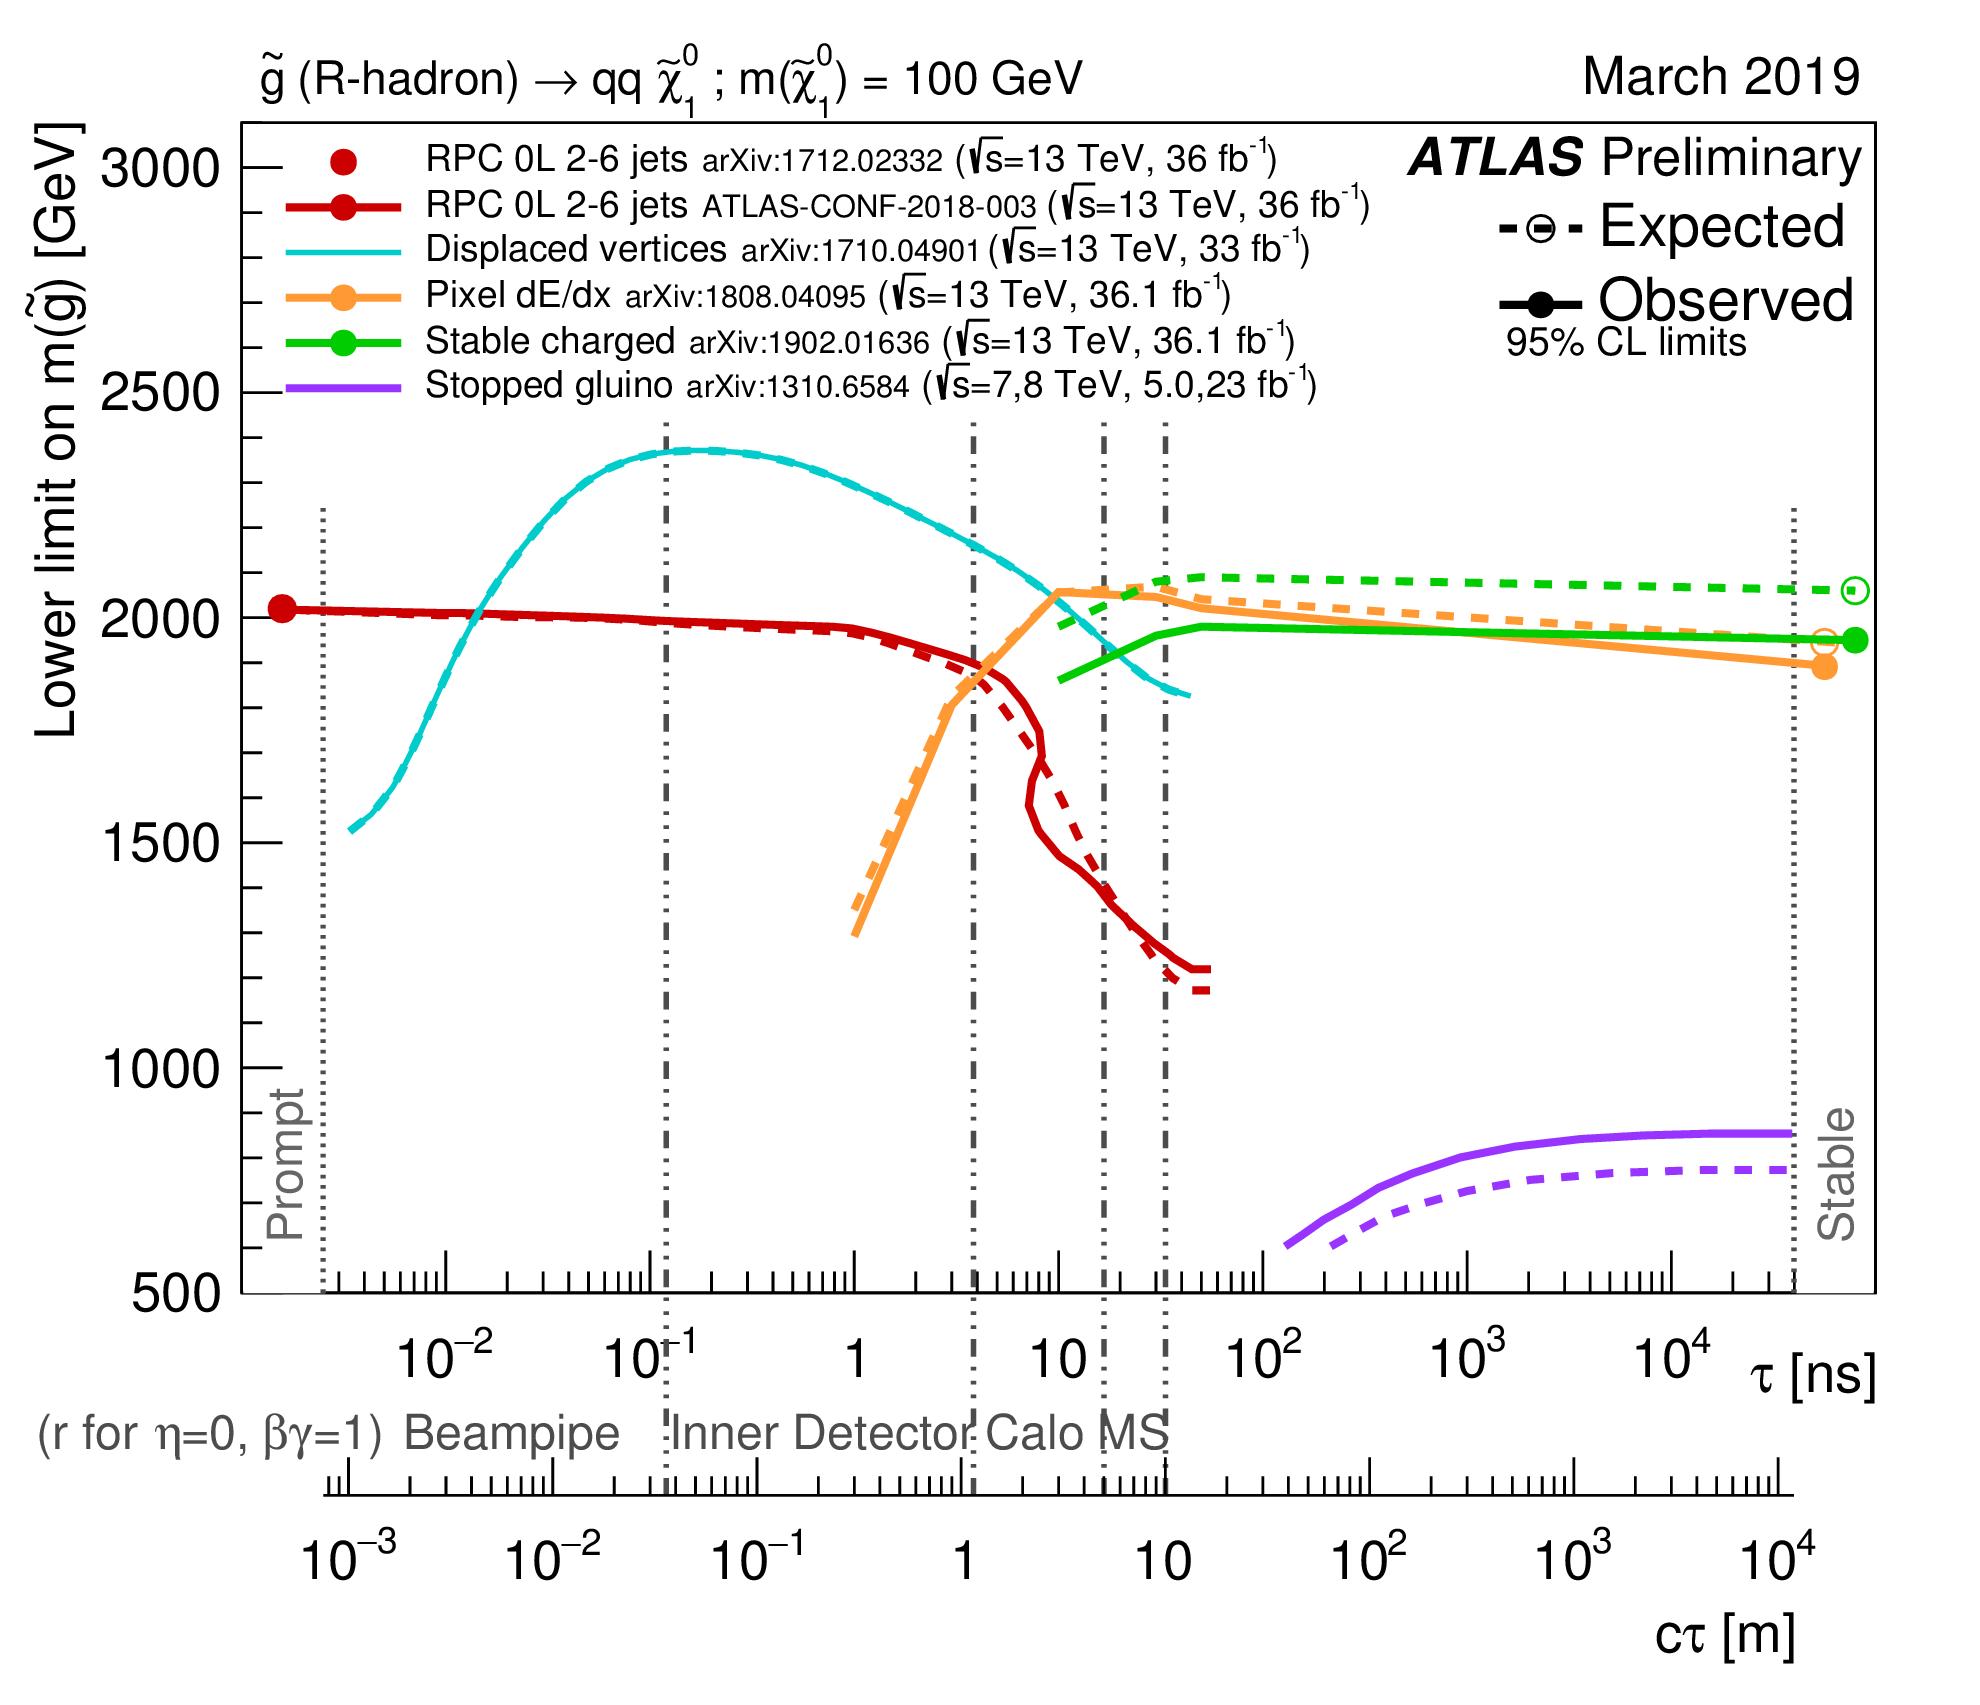 https://atlas.web.cern.ch/Atlas/GROUPS/PHYSICS/CombinedSummaryPlots/SUSY/ATLAS_SUSY_LLP/ATLAS_SUSY_LLP.png